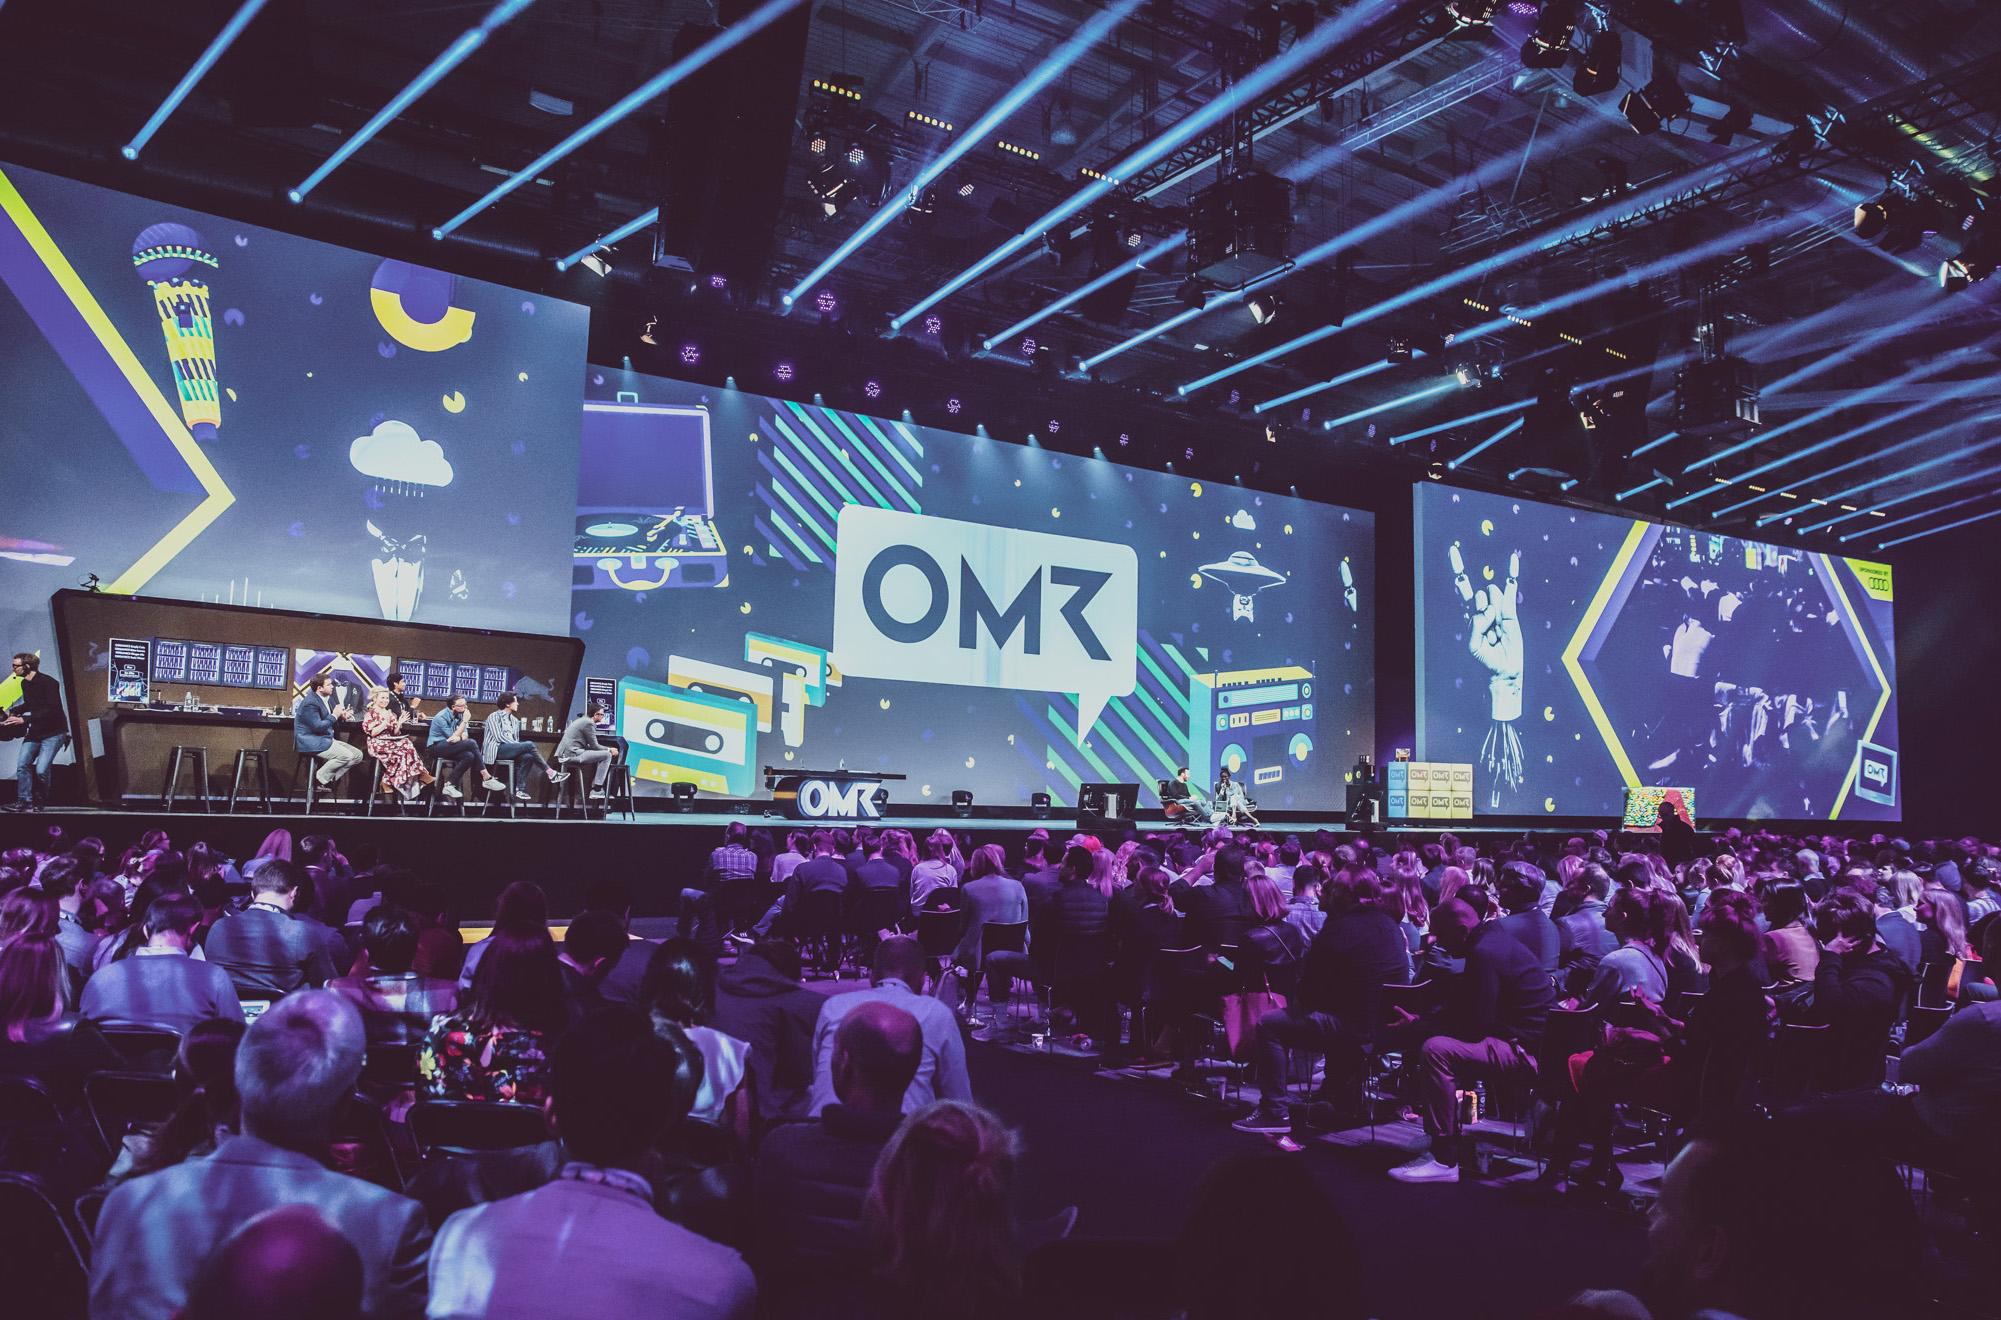 Das OMR Festival 2019 in Hamburg